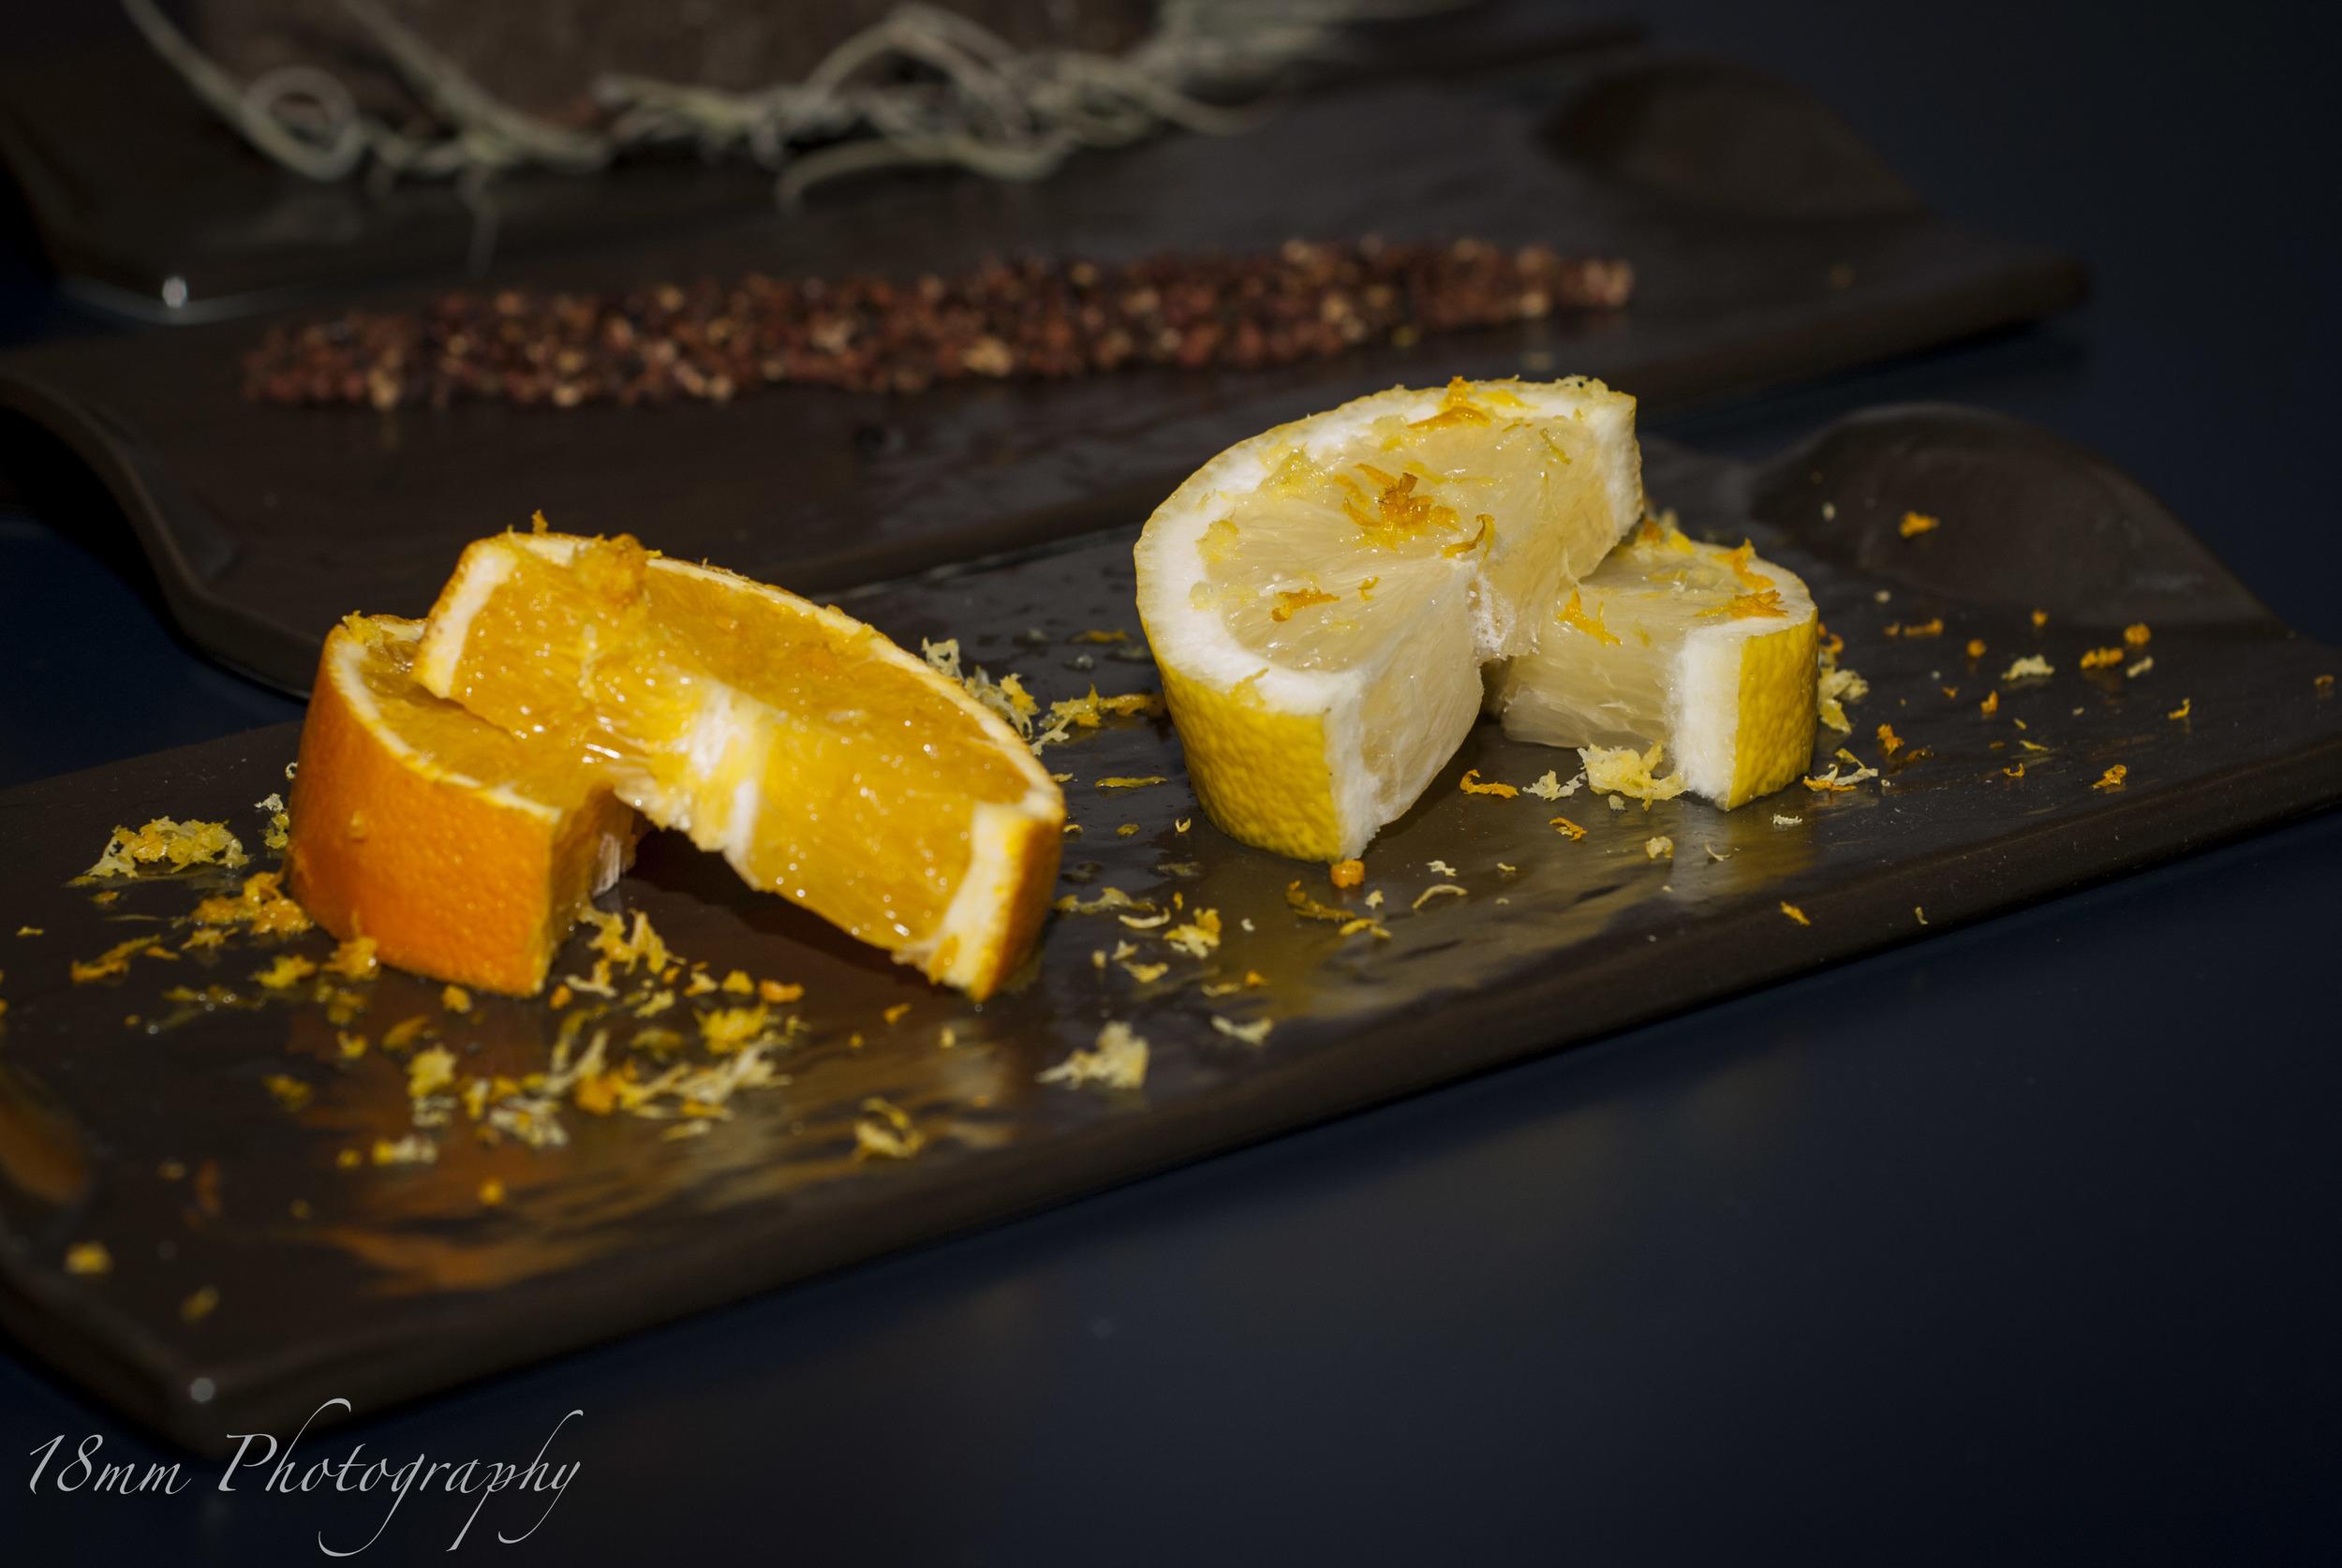 Food Photography-01.jpg